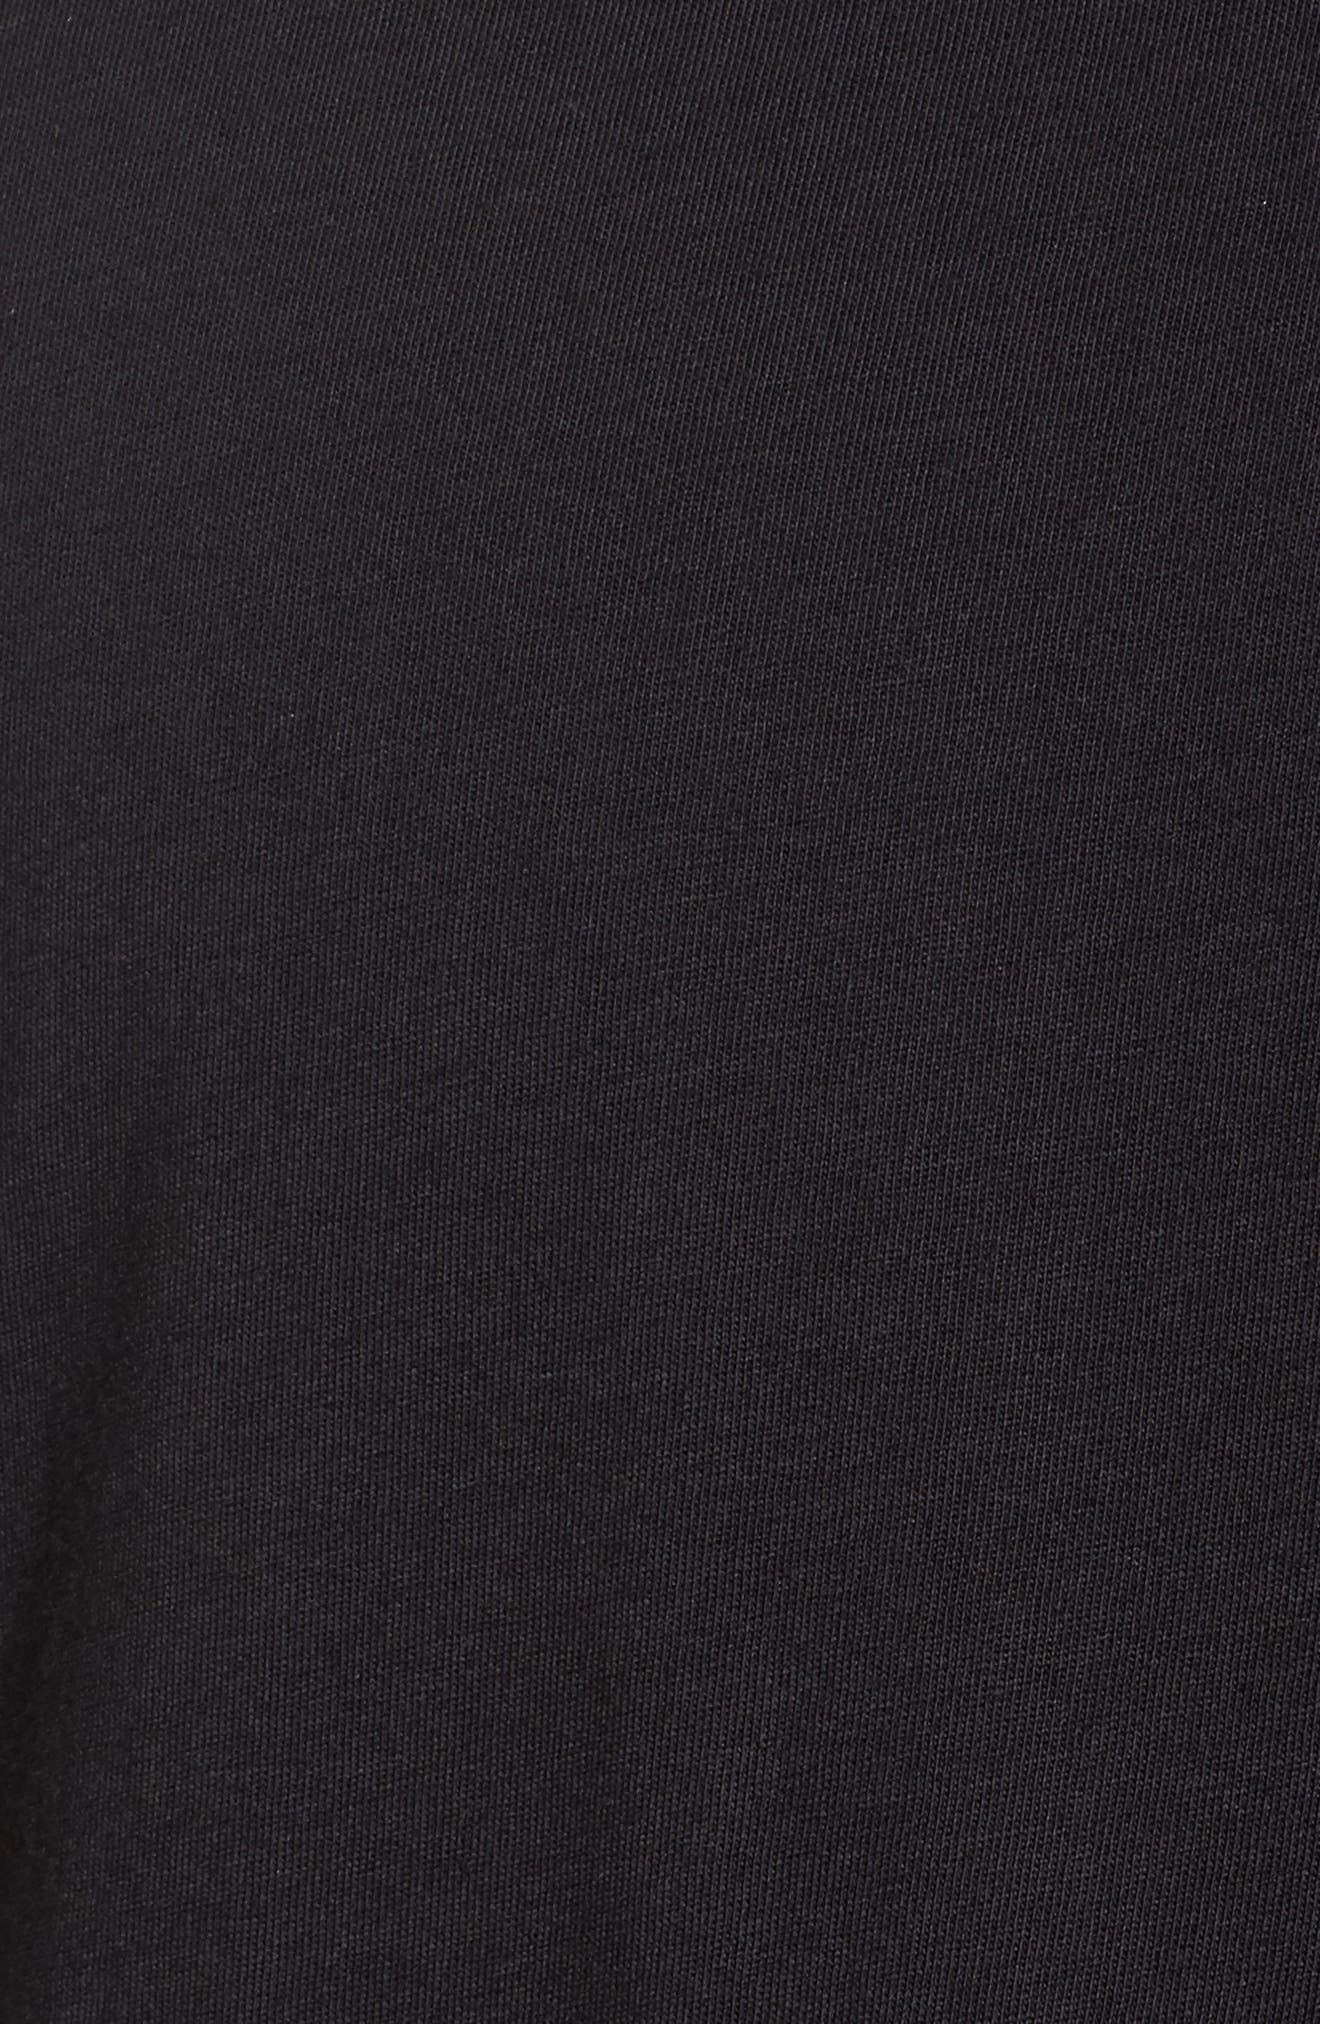 Hugo Boss Drison Hashmark Graphic T-Shirt,                             Alternate thumbnail 5, color,